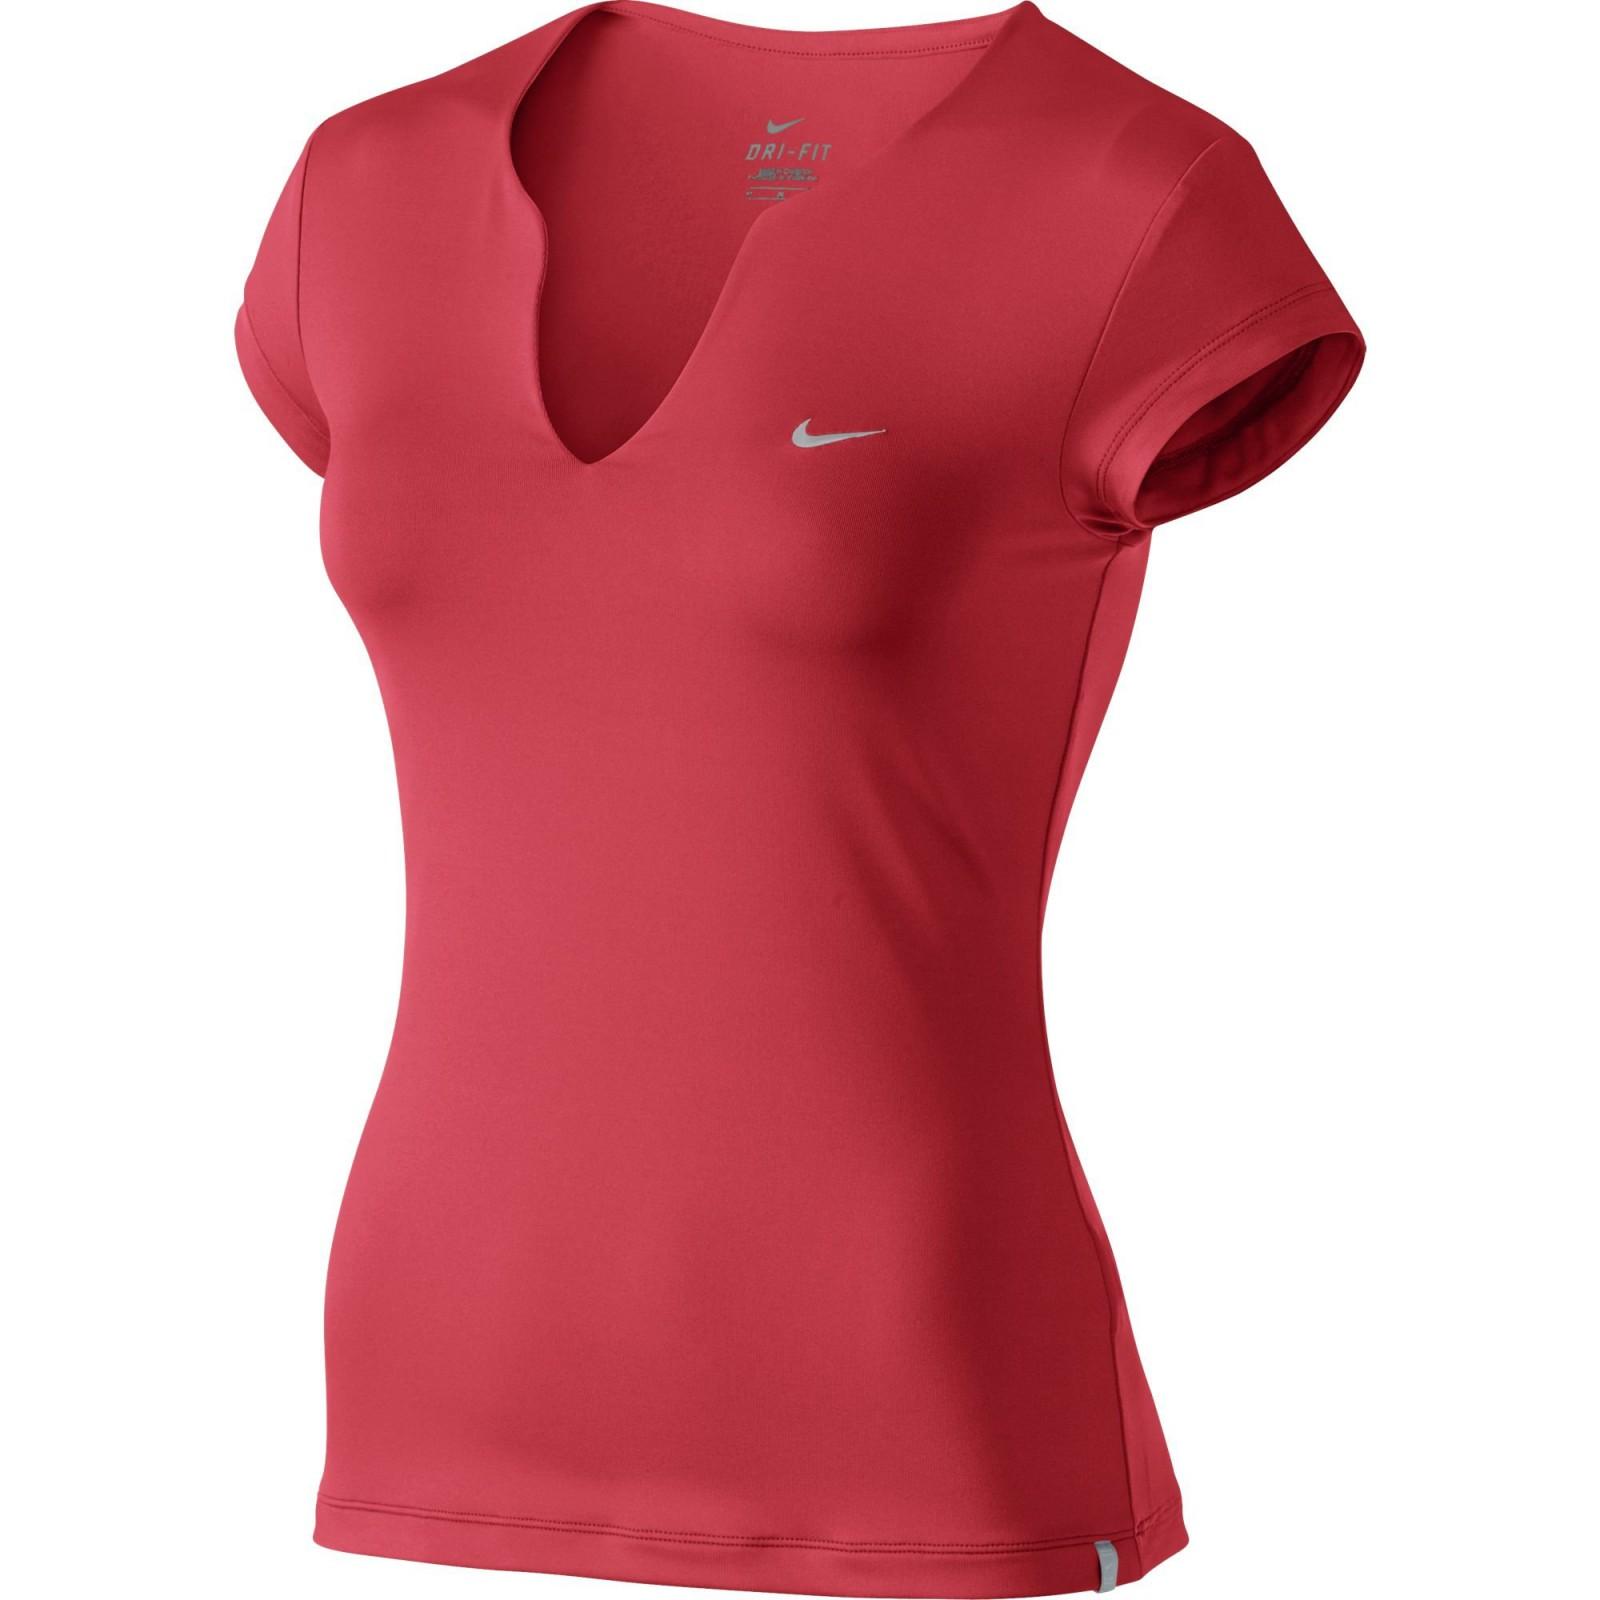 06bfeae6142f Dámské tričko Nike PURE SS TOP